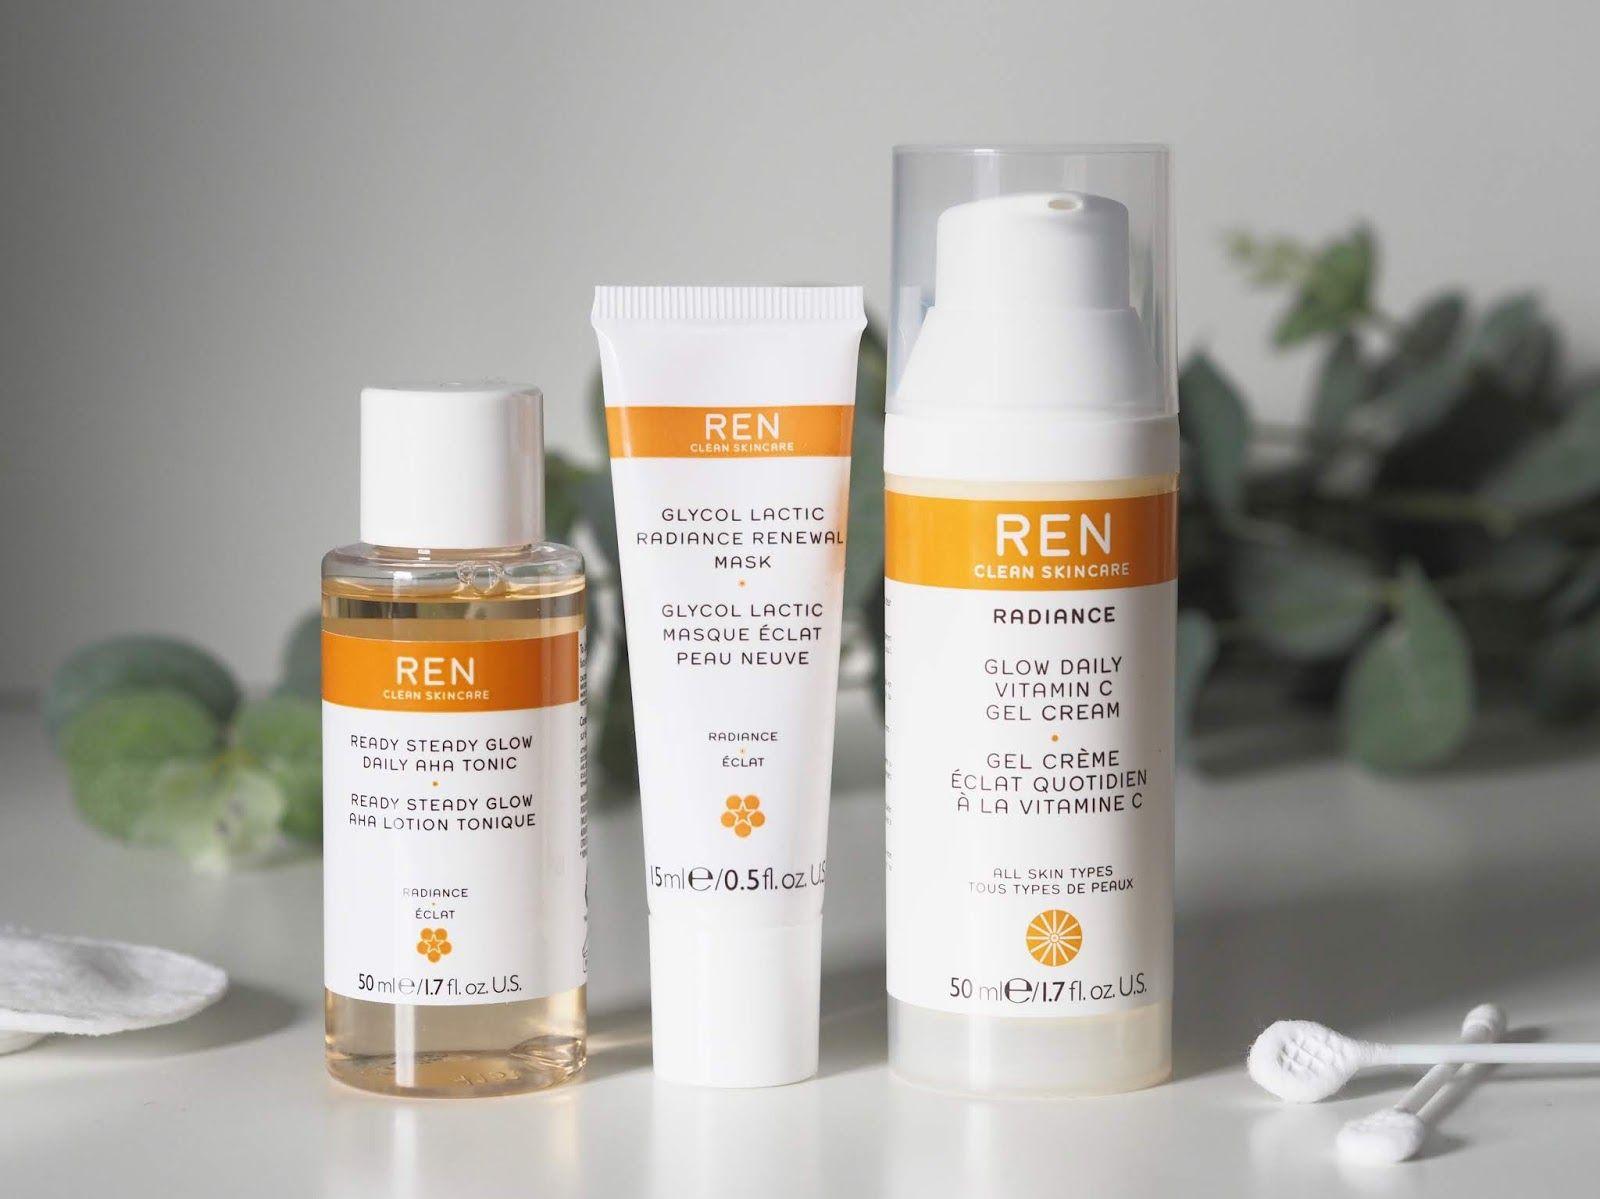 Ren Clean Skincare Glow Daily Vitamin C Gel Cream Review Ready Steady Glow Aha Tonic Glycol Lactic Radiance Renewal Mask Gel Cream Gel Daily Vitamins